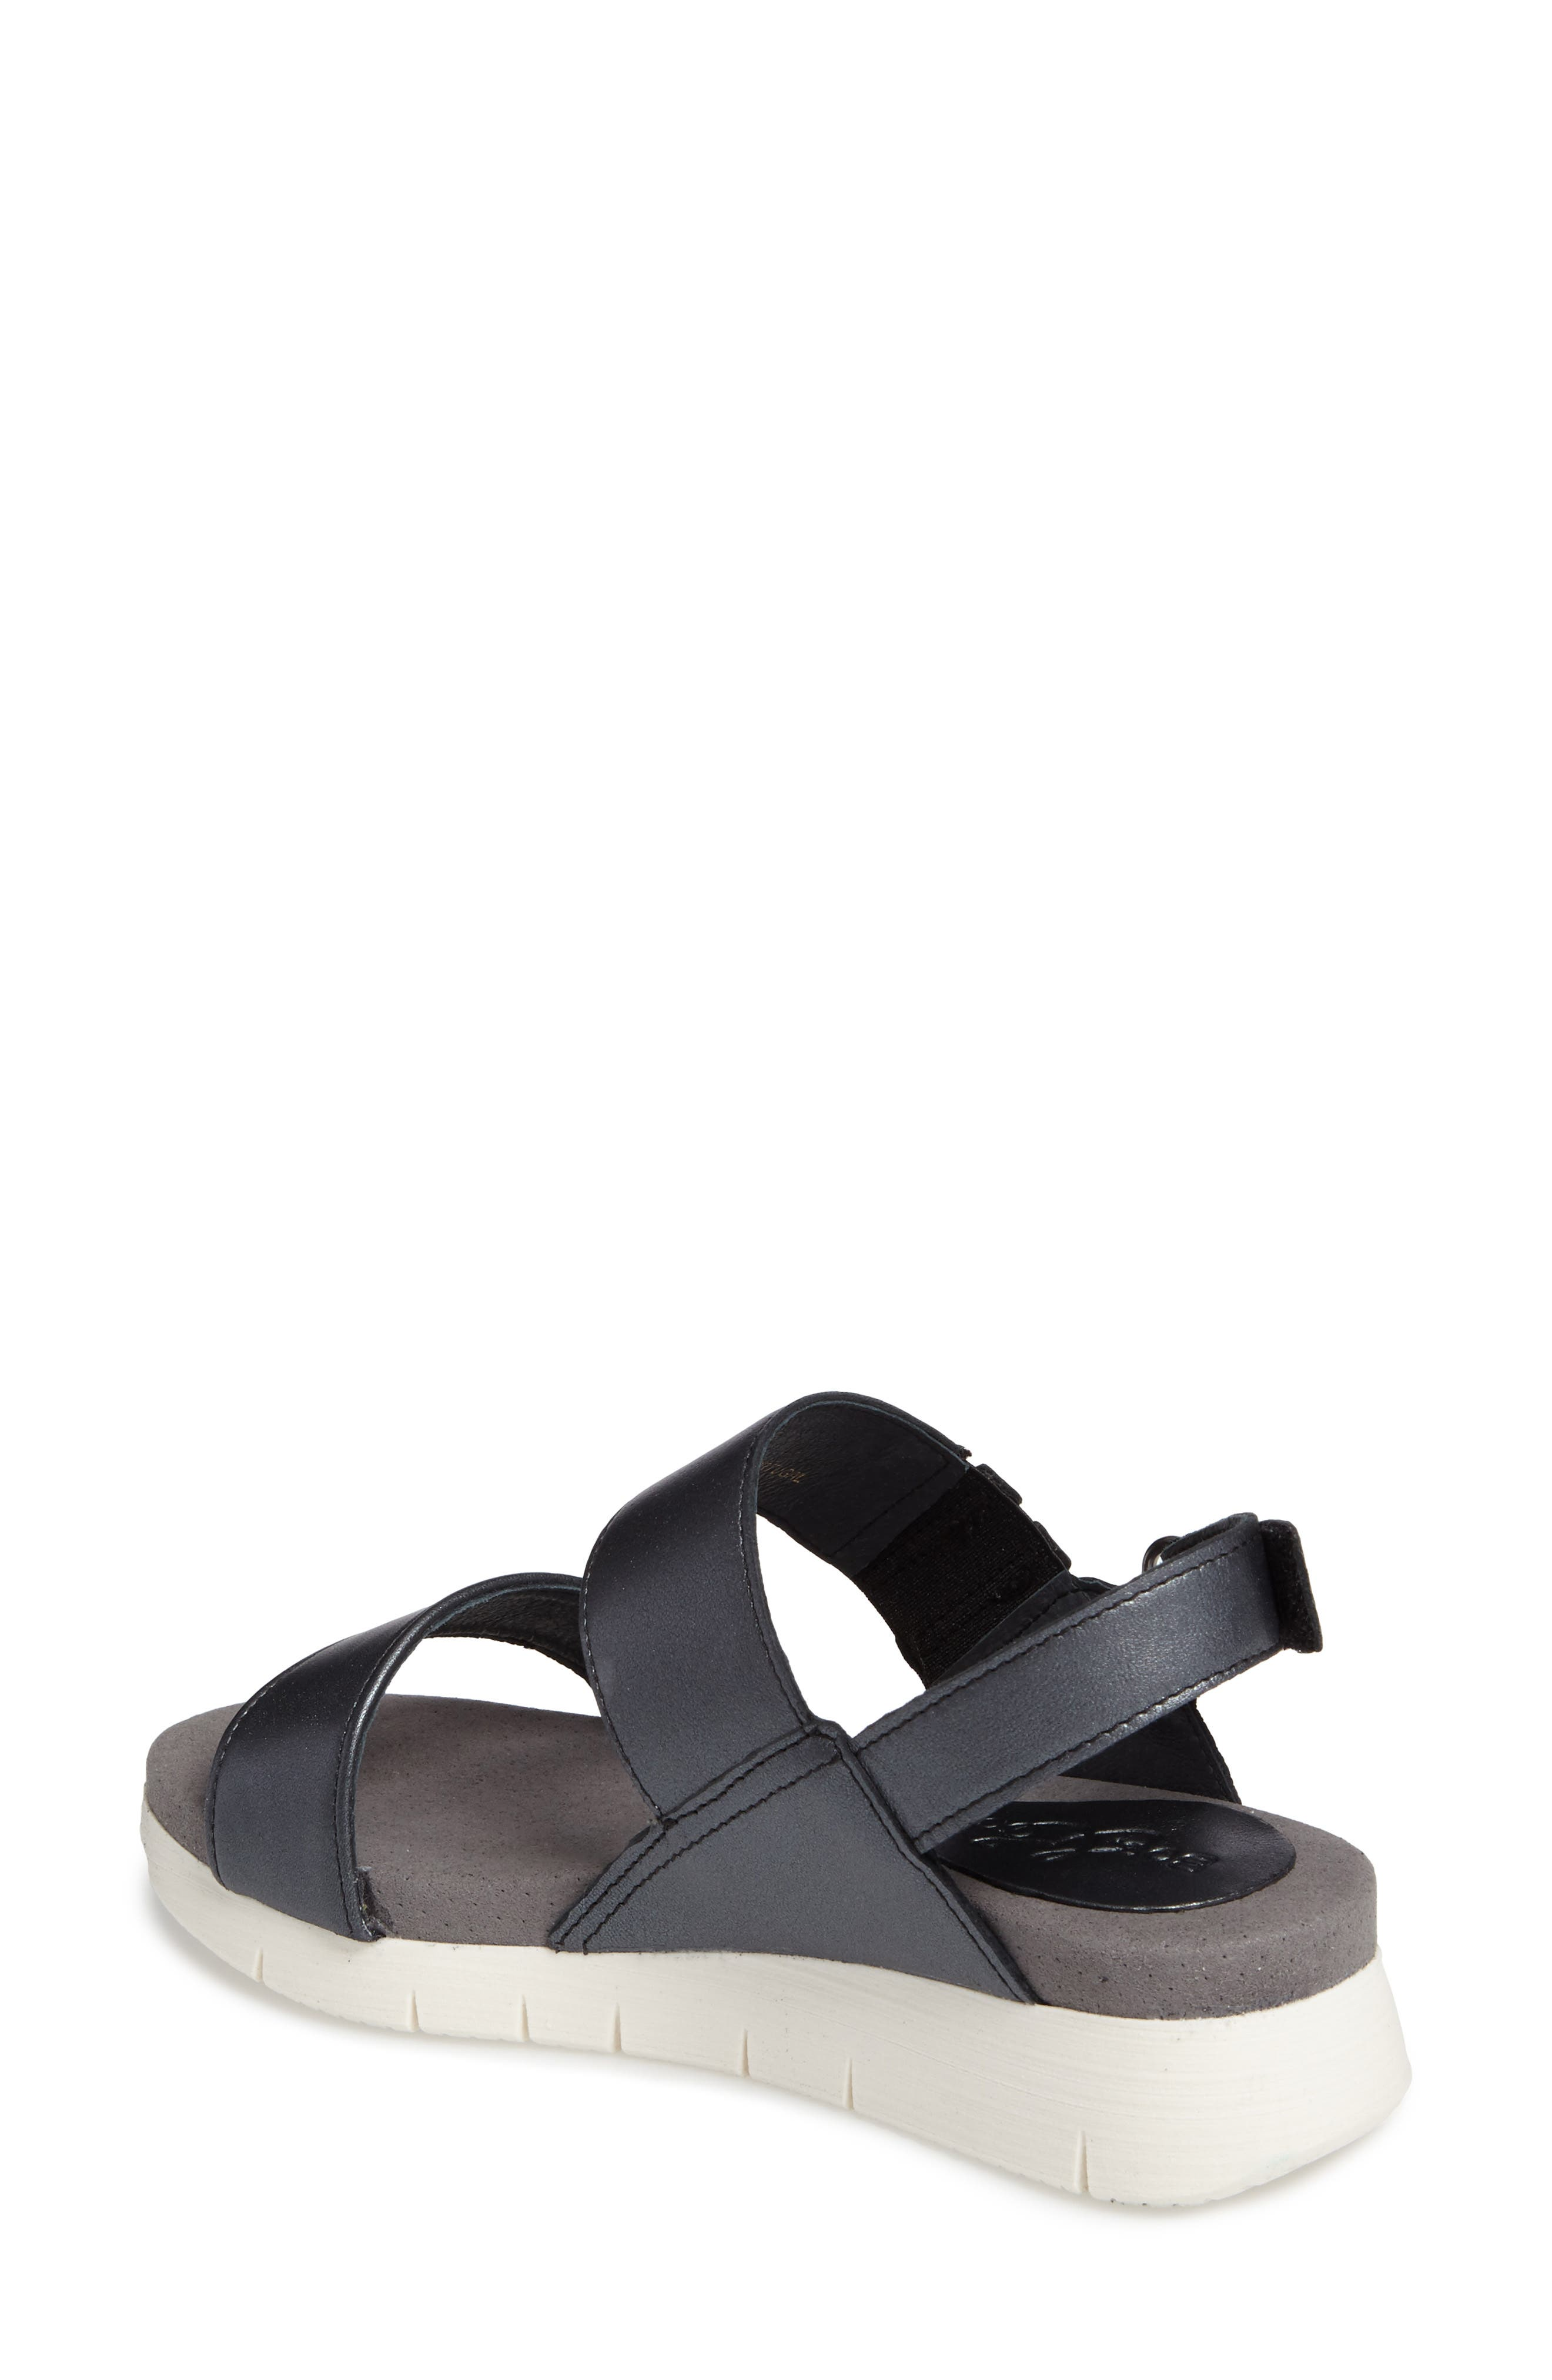 Payge Wedge Sandal,                             Alternate thumbnail 2, color,                             BLACK LEATHER